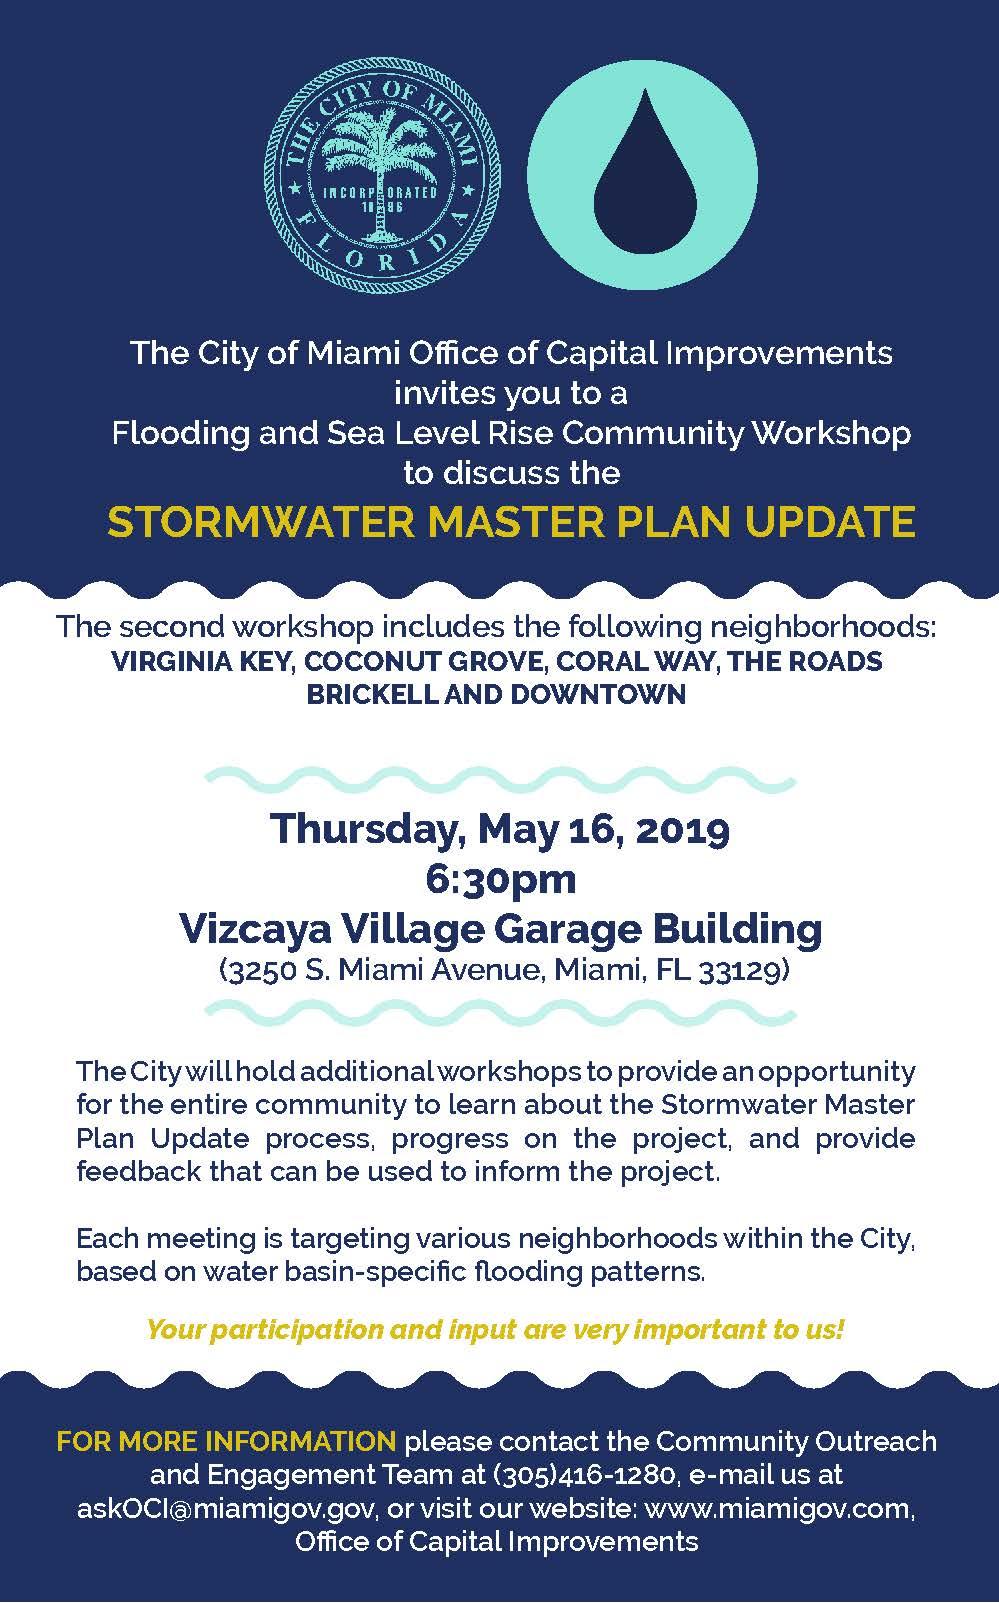 Storm Water Master Plan Meeting Flyer 2.jpg